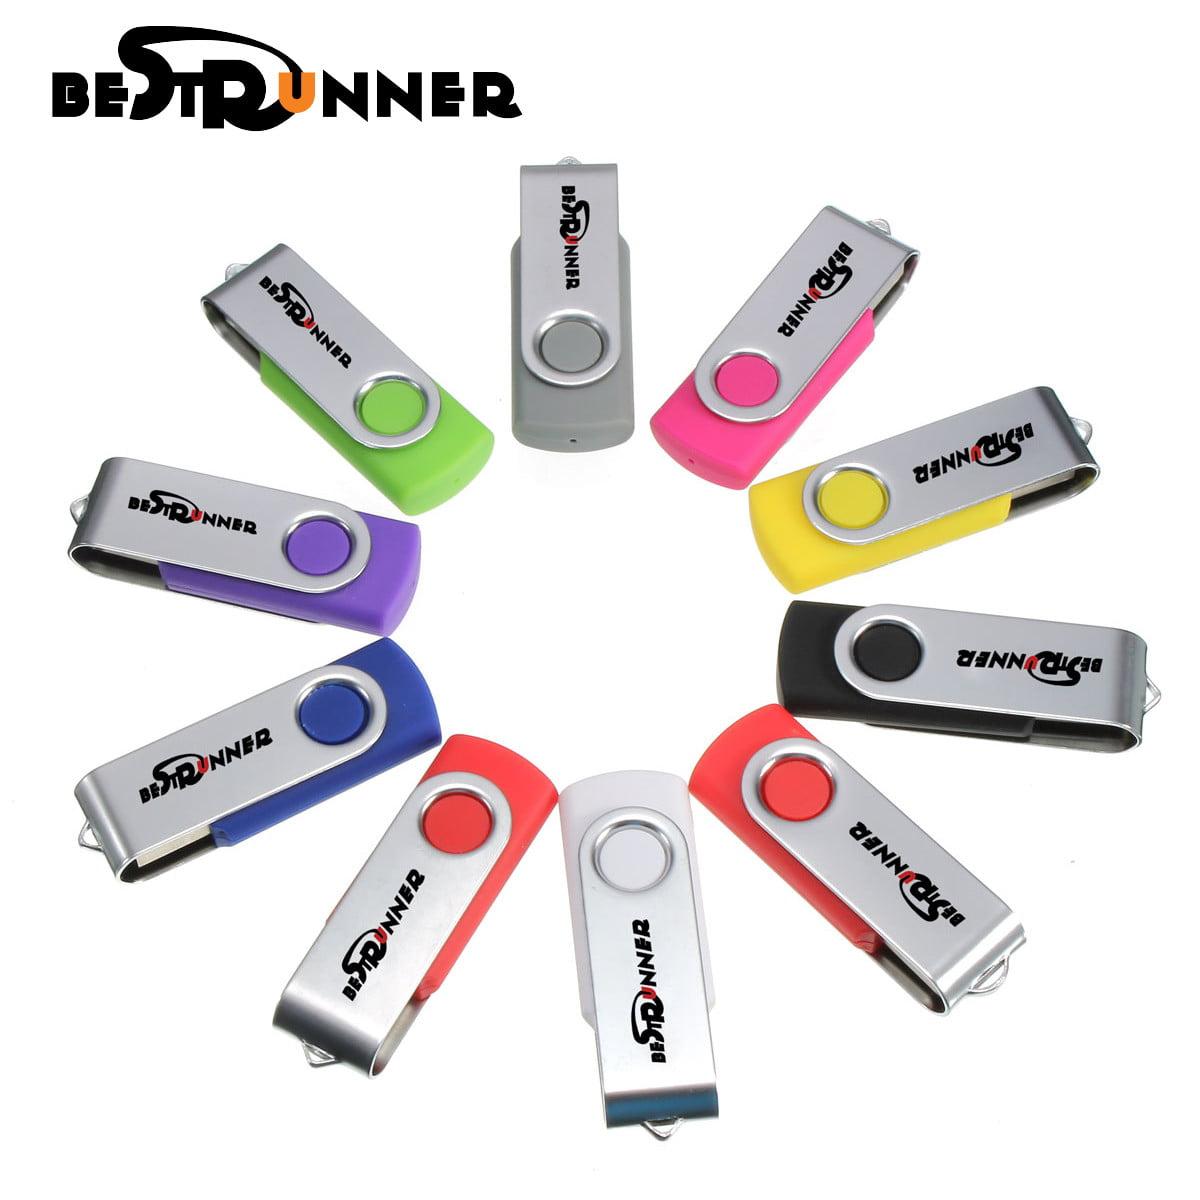 8GB memorystickdrive 8G 8 GB G USB 2.0 Memory Stick Flash Drive Speicher Speichstick Memorystick